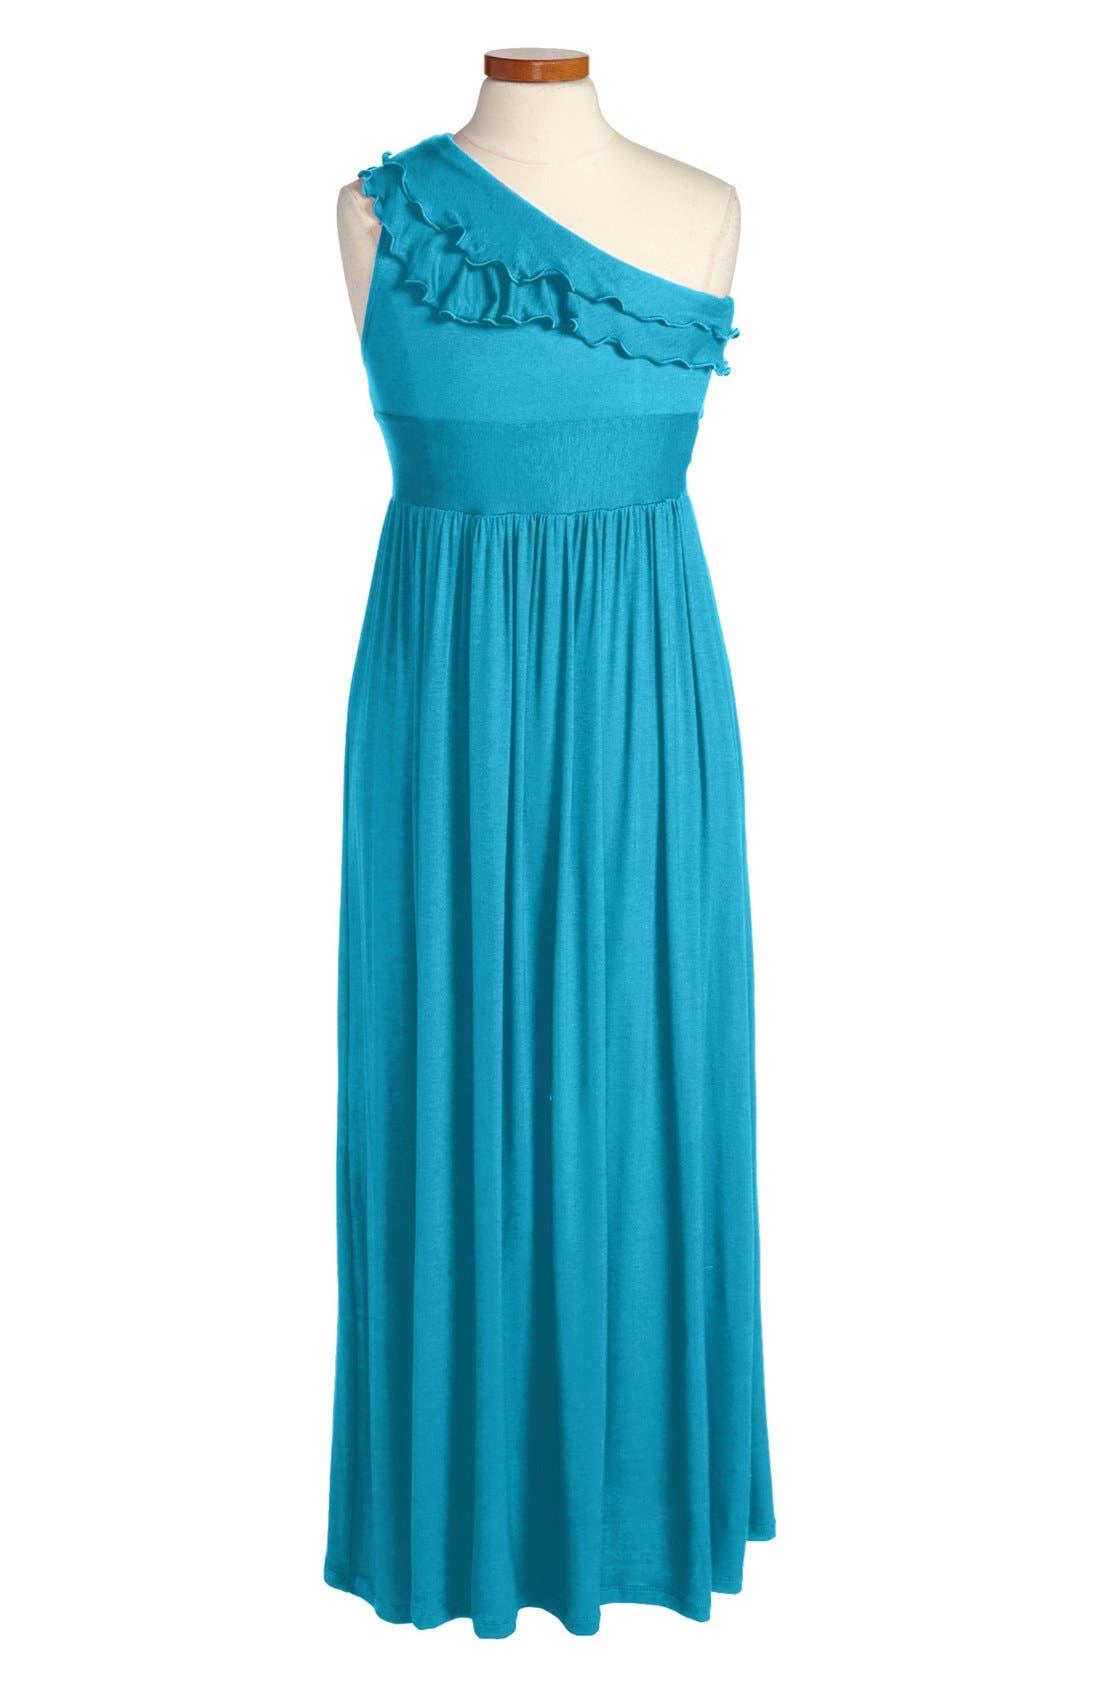 Main Image - Fiveloaves Twofish One-Shoulder Maxi Dress (Big Girls)